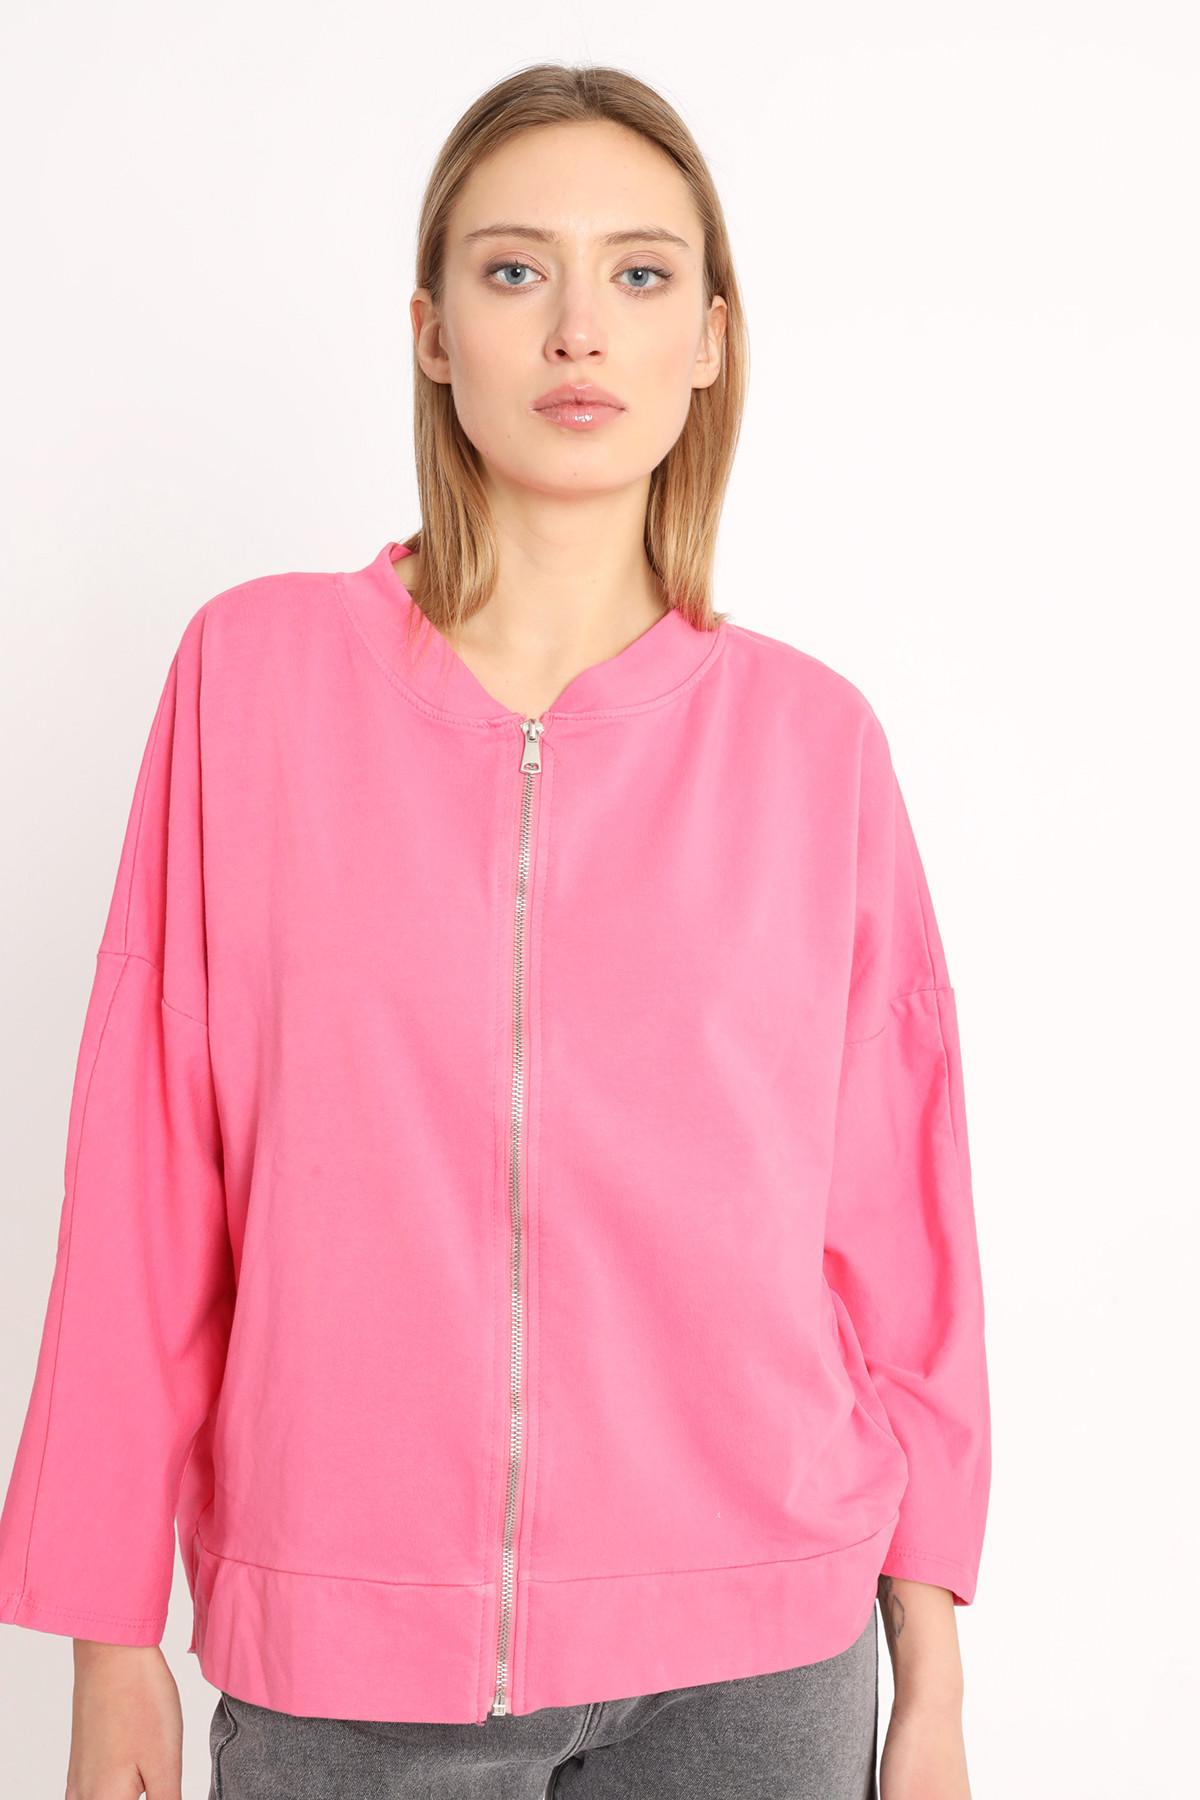 Full Zip Raglan Sleeve Sweatshirt